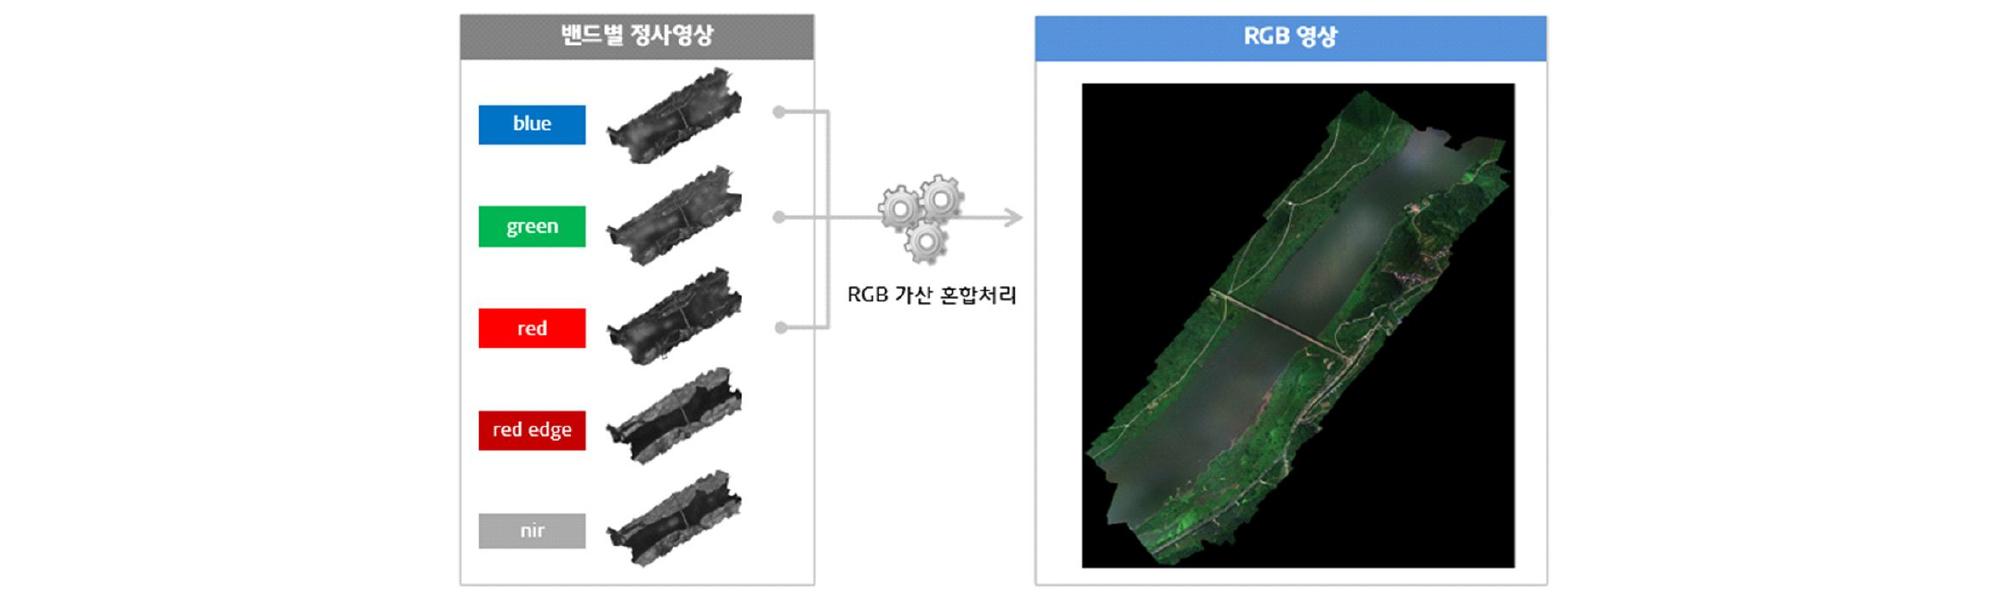 http://static.apub.kr/journalsite/sites/kwra/2020-053-06/N0200530607/images/kwra_53_06_07_F3.jpg